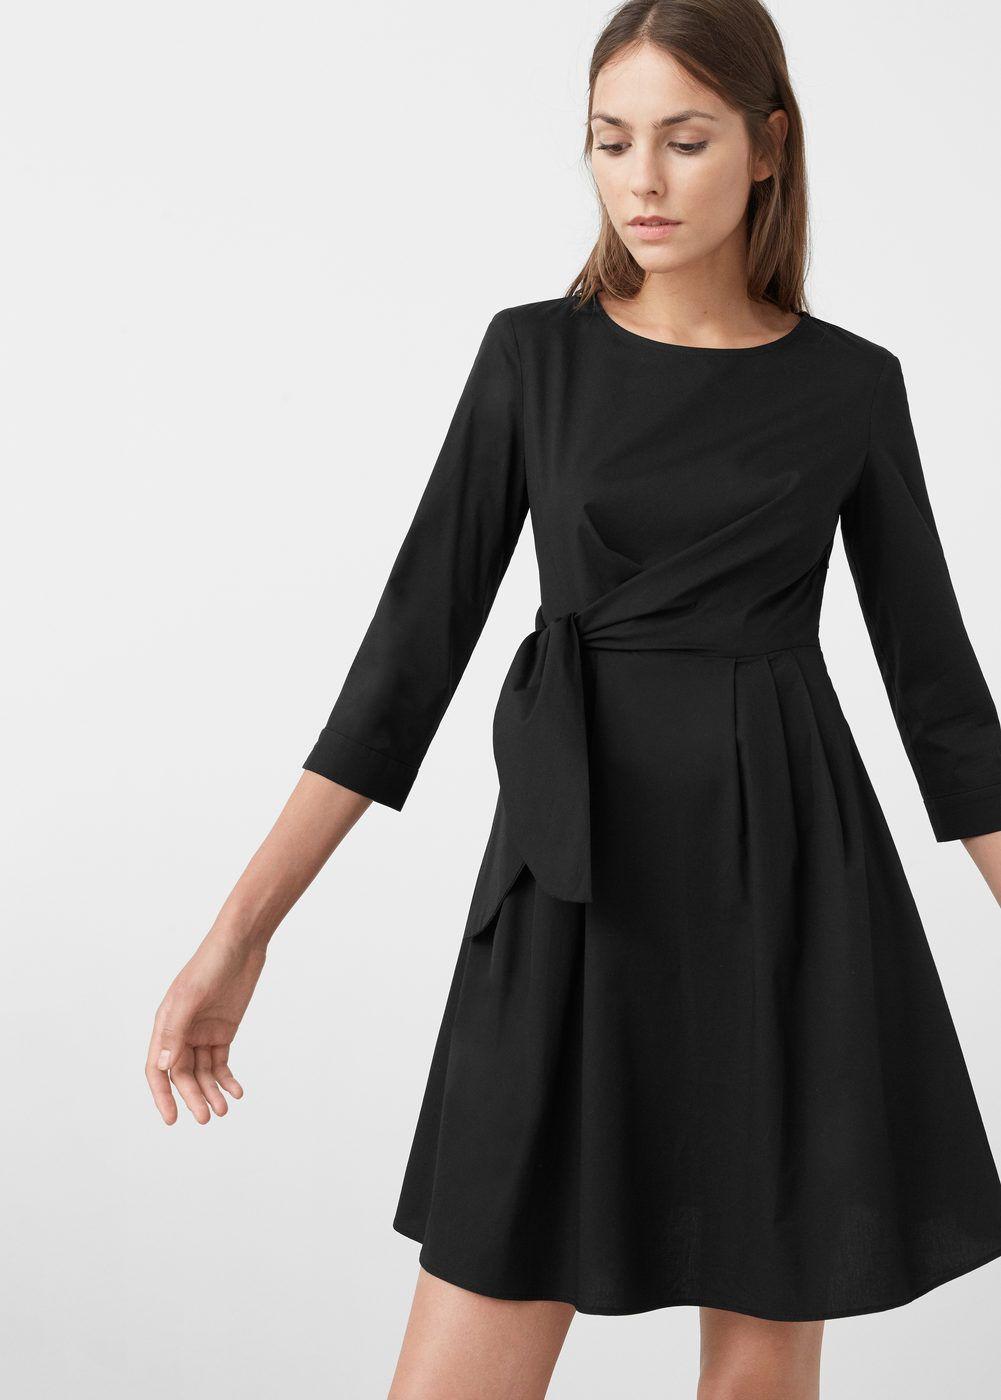 Black tie dresses manteca